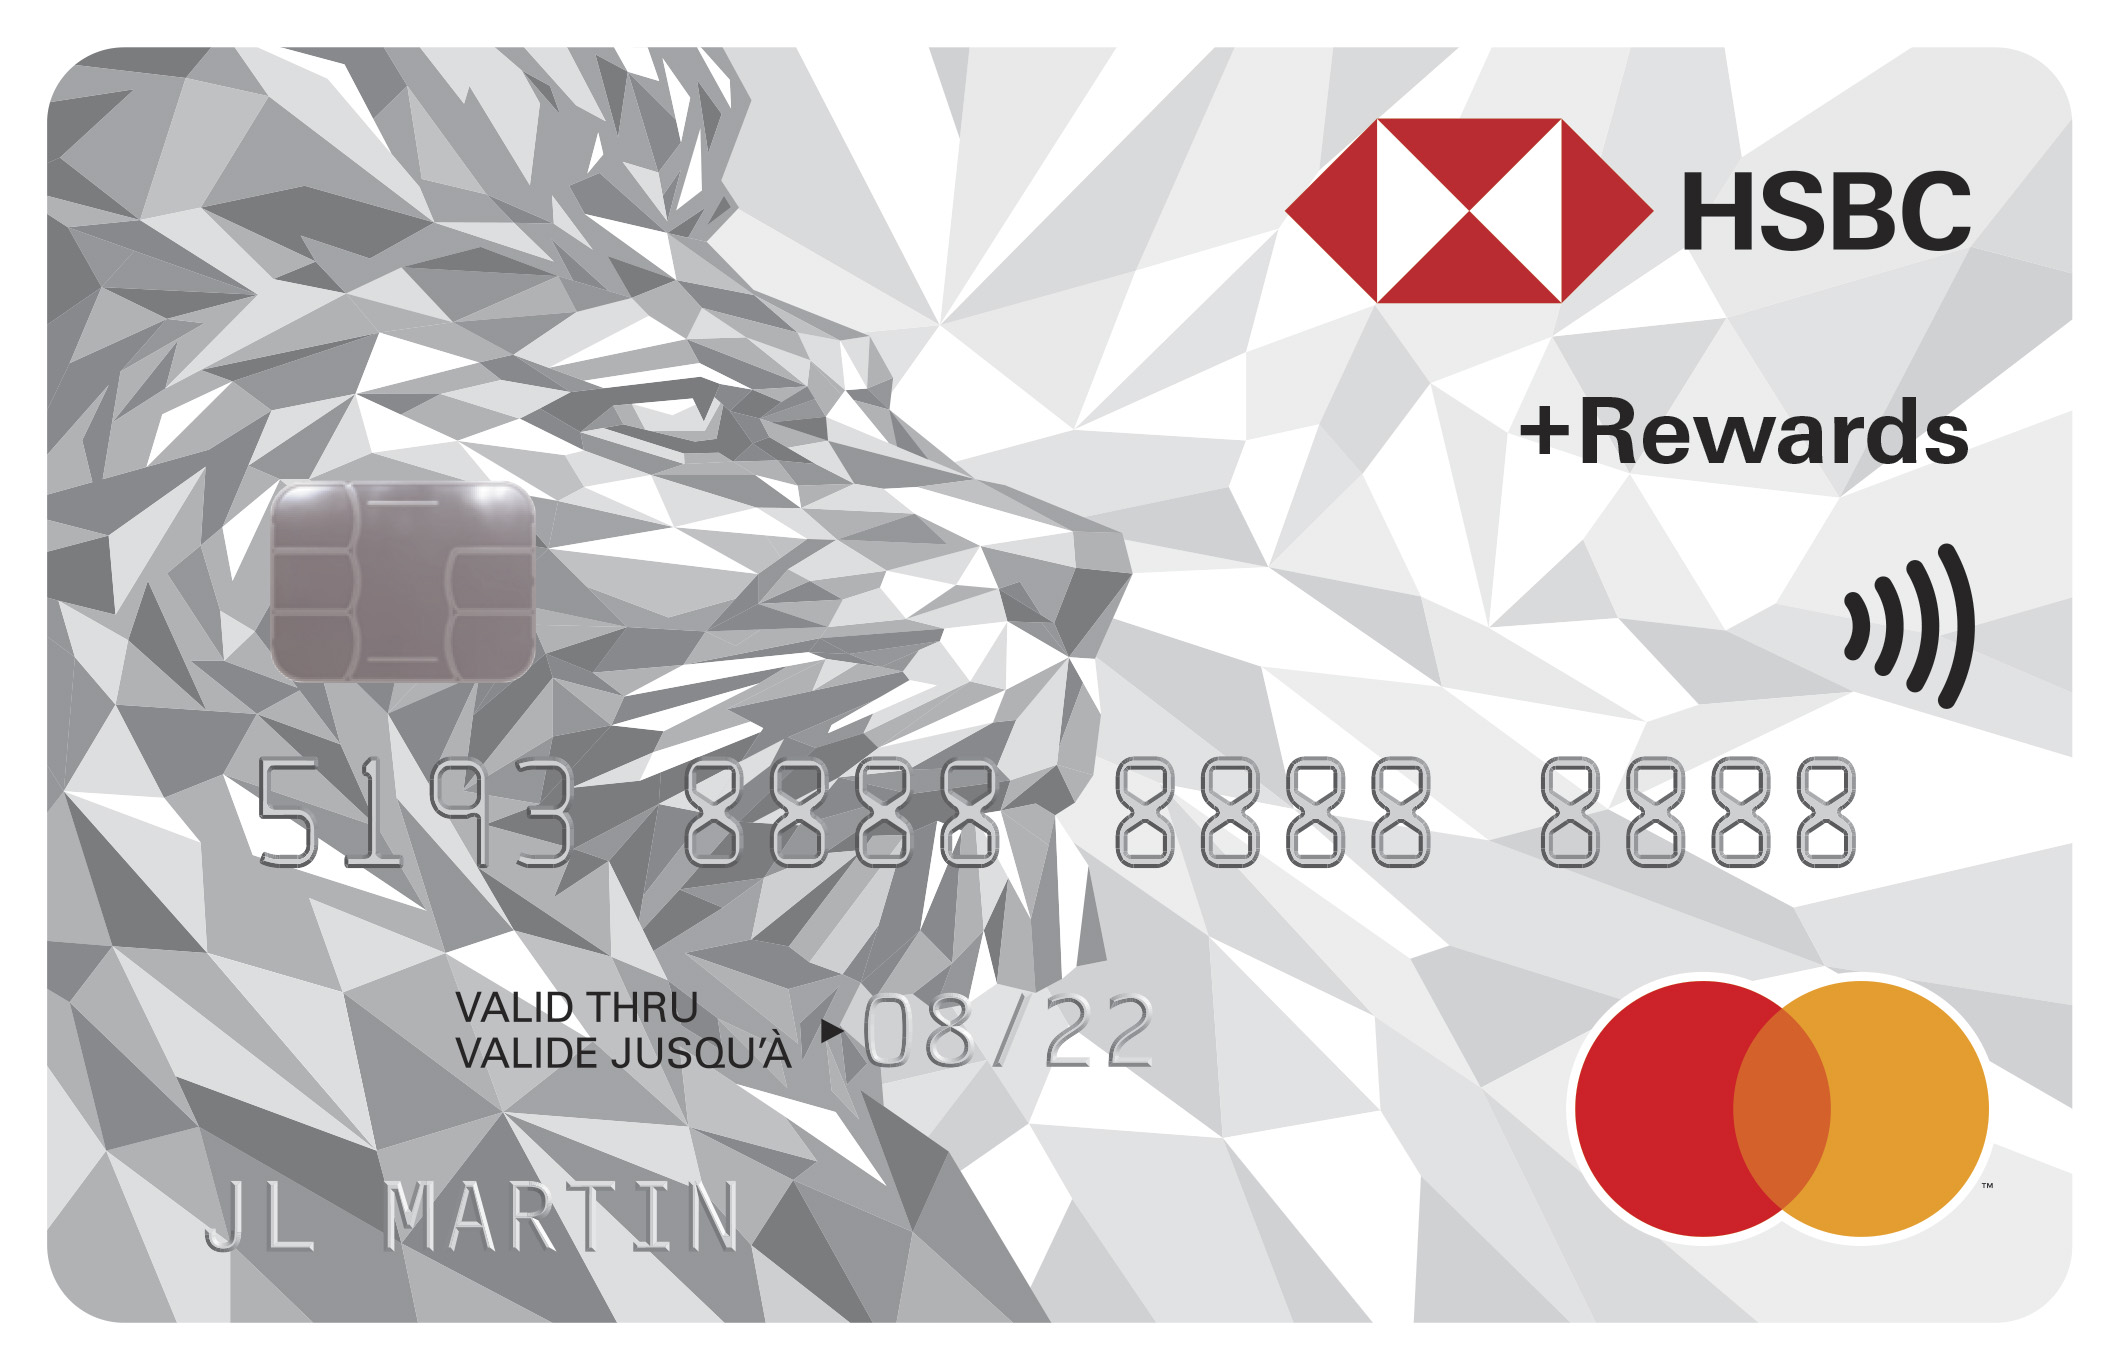 HSBC +Rewards Mastercard (excl. QC)